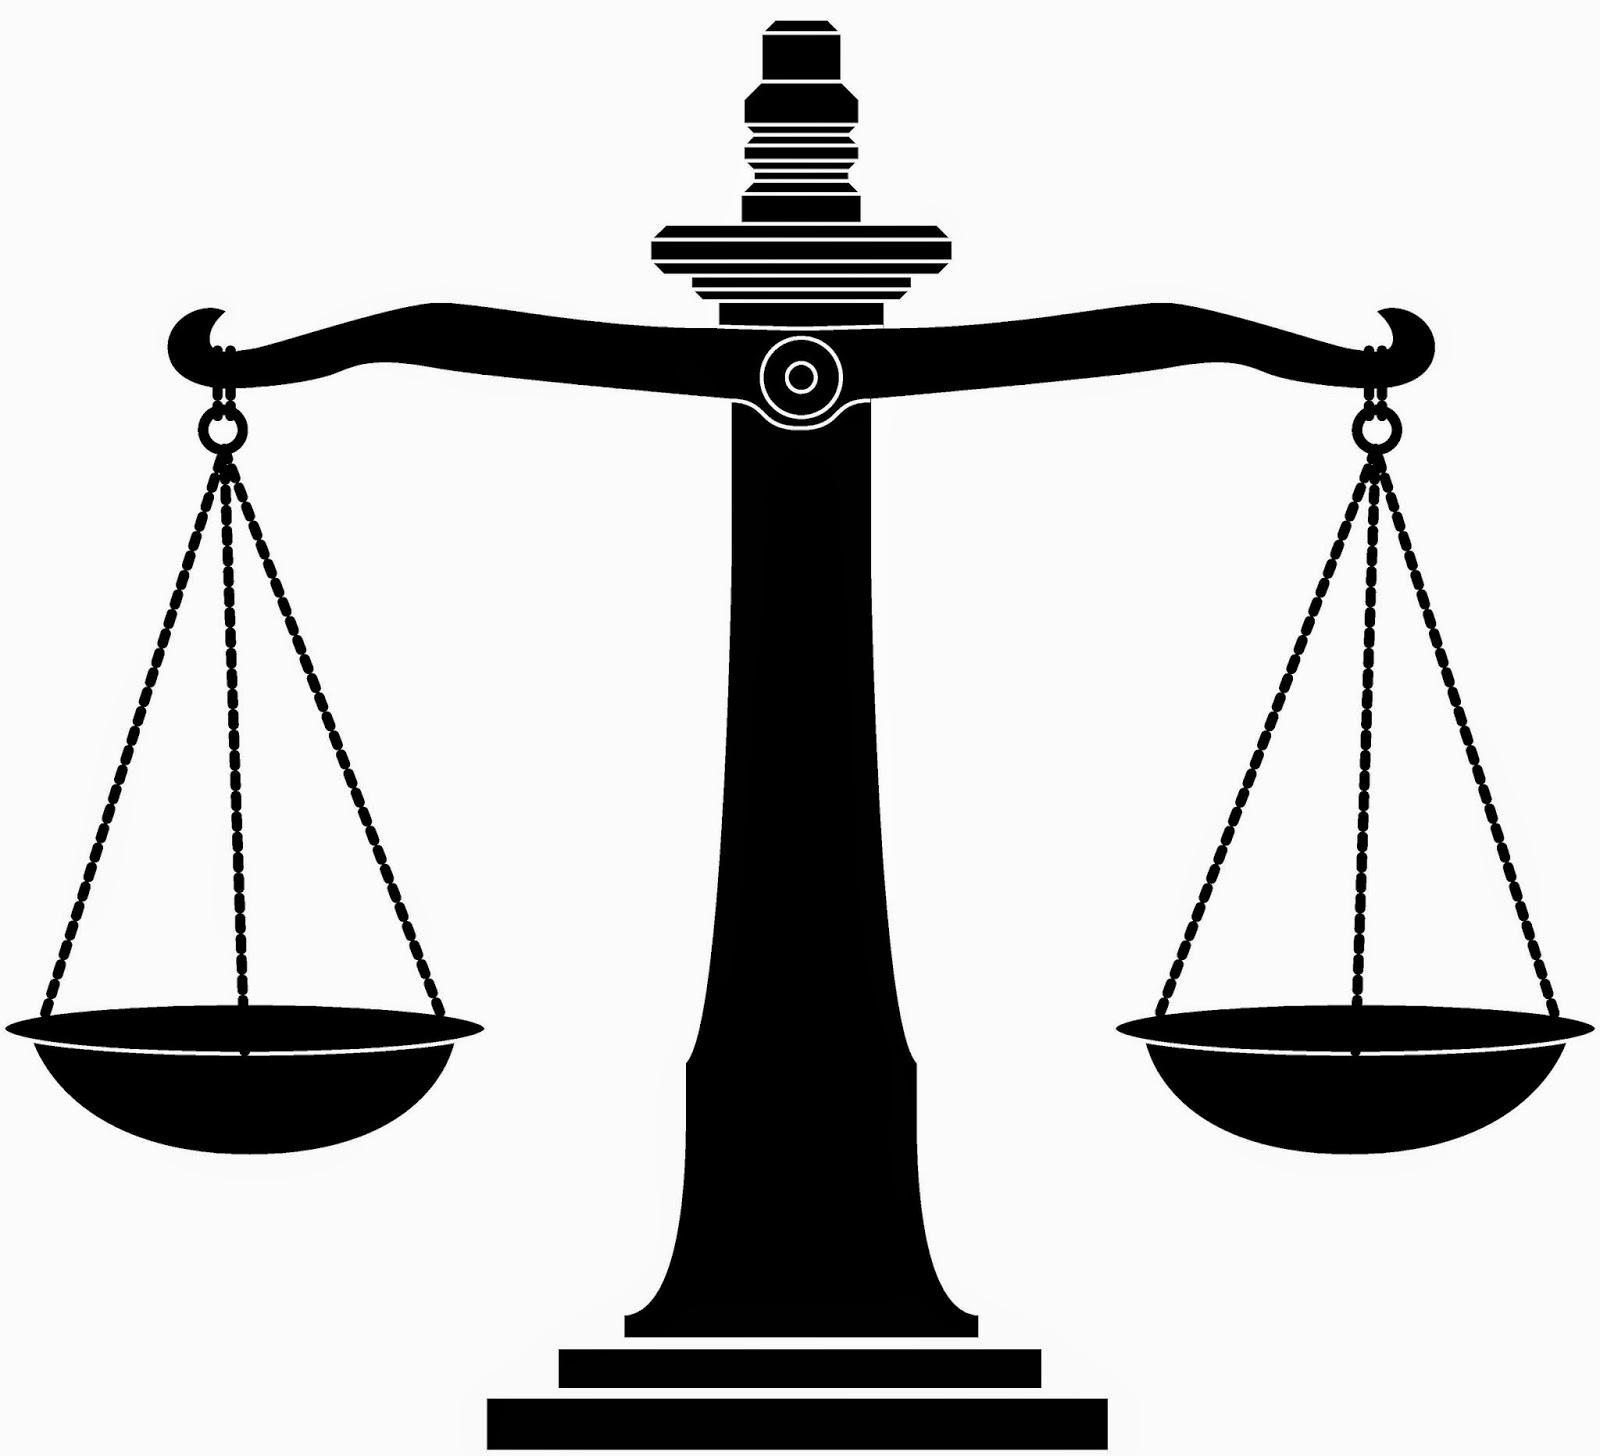 klymer klatsch justice or righteousness rh donrclymer blogspot com Scales of Justice No Background Scales of Justice No Background